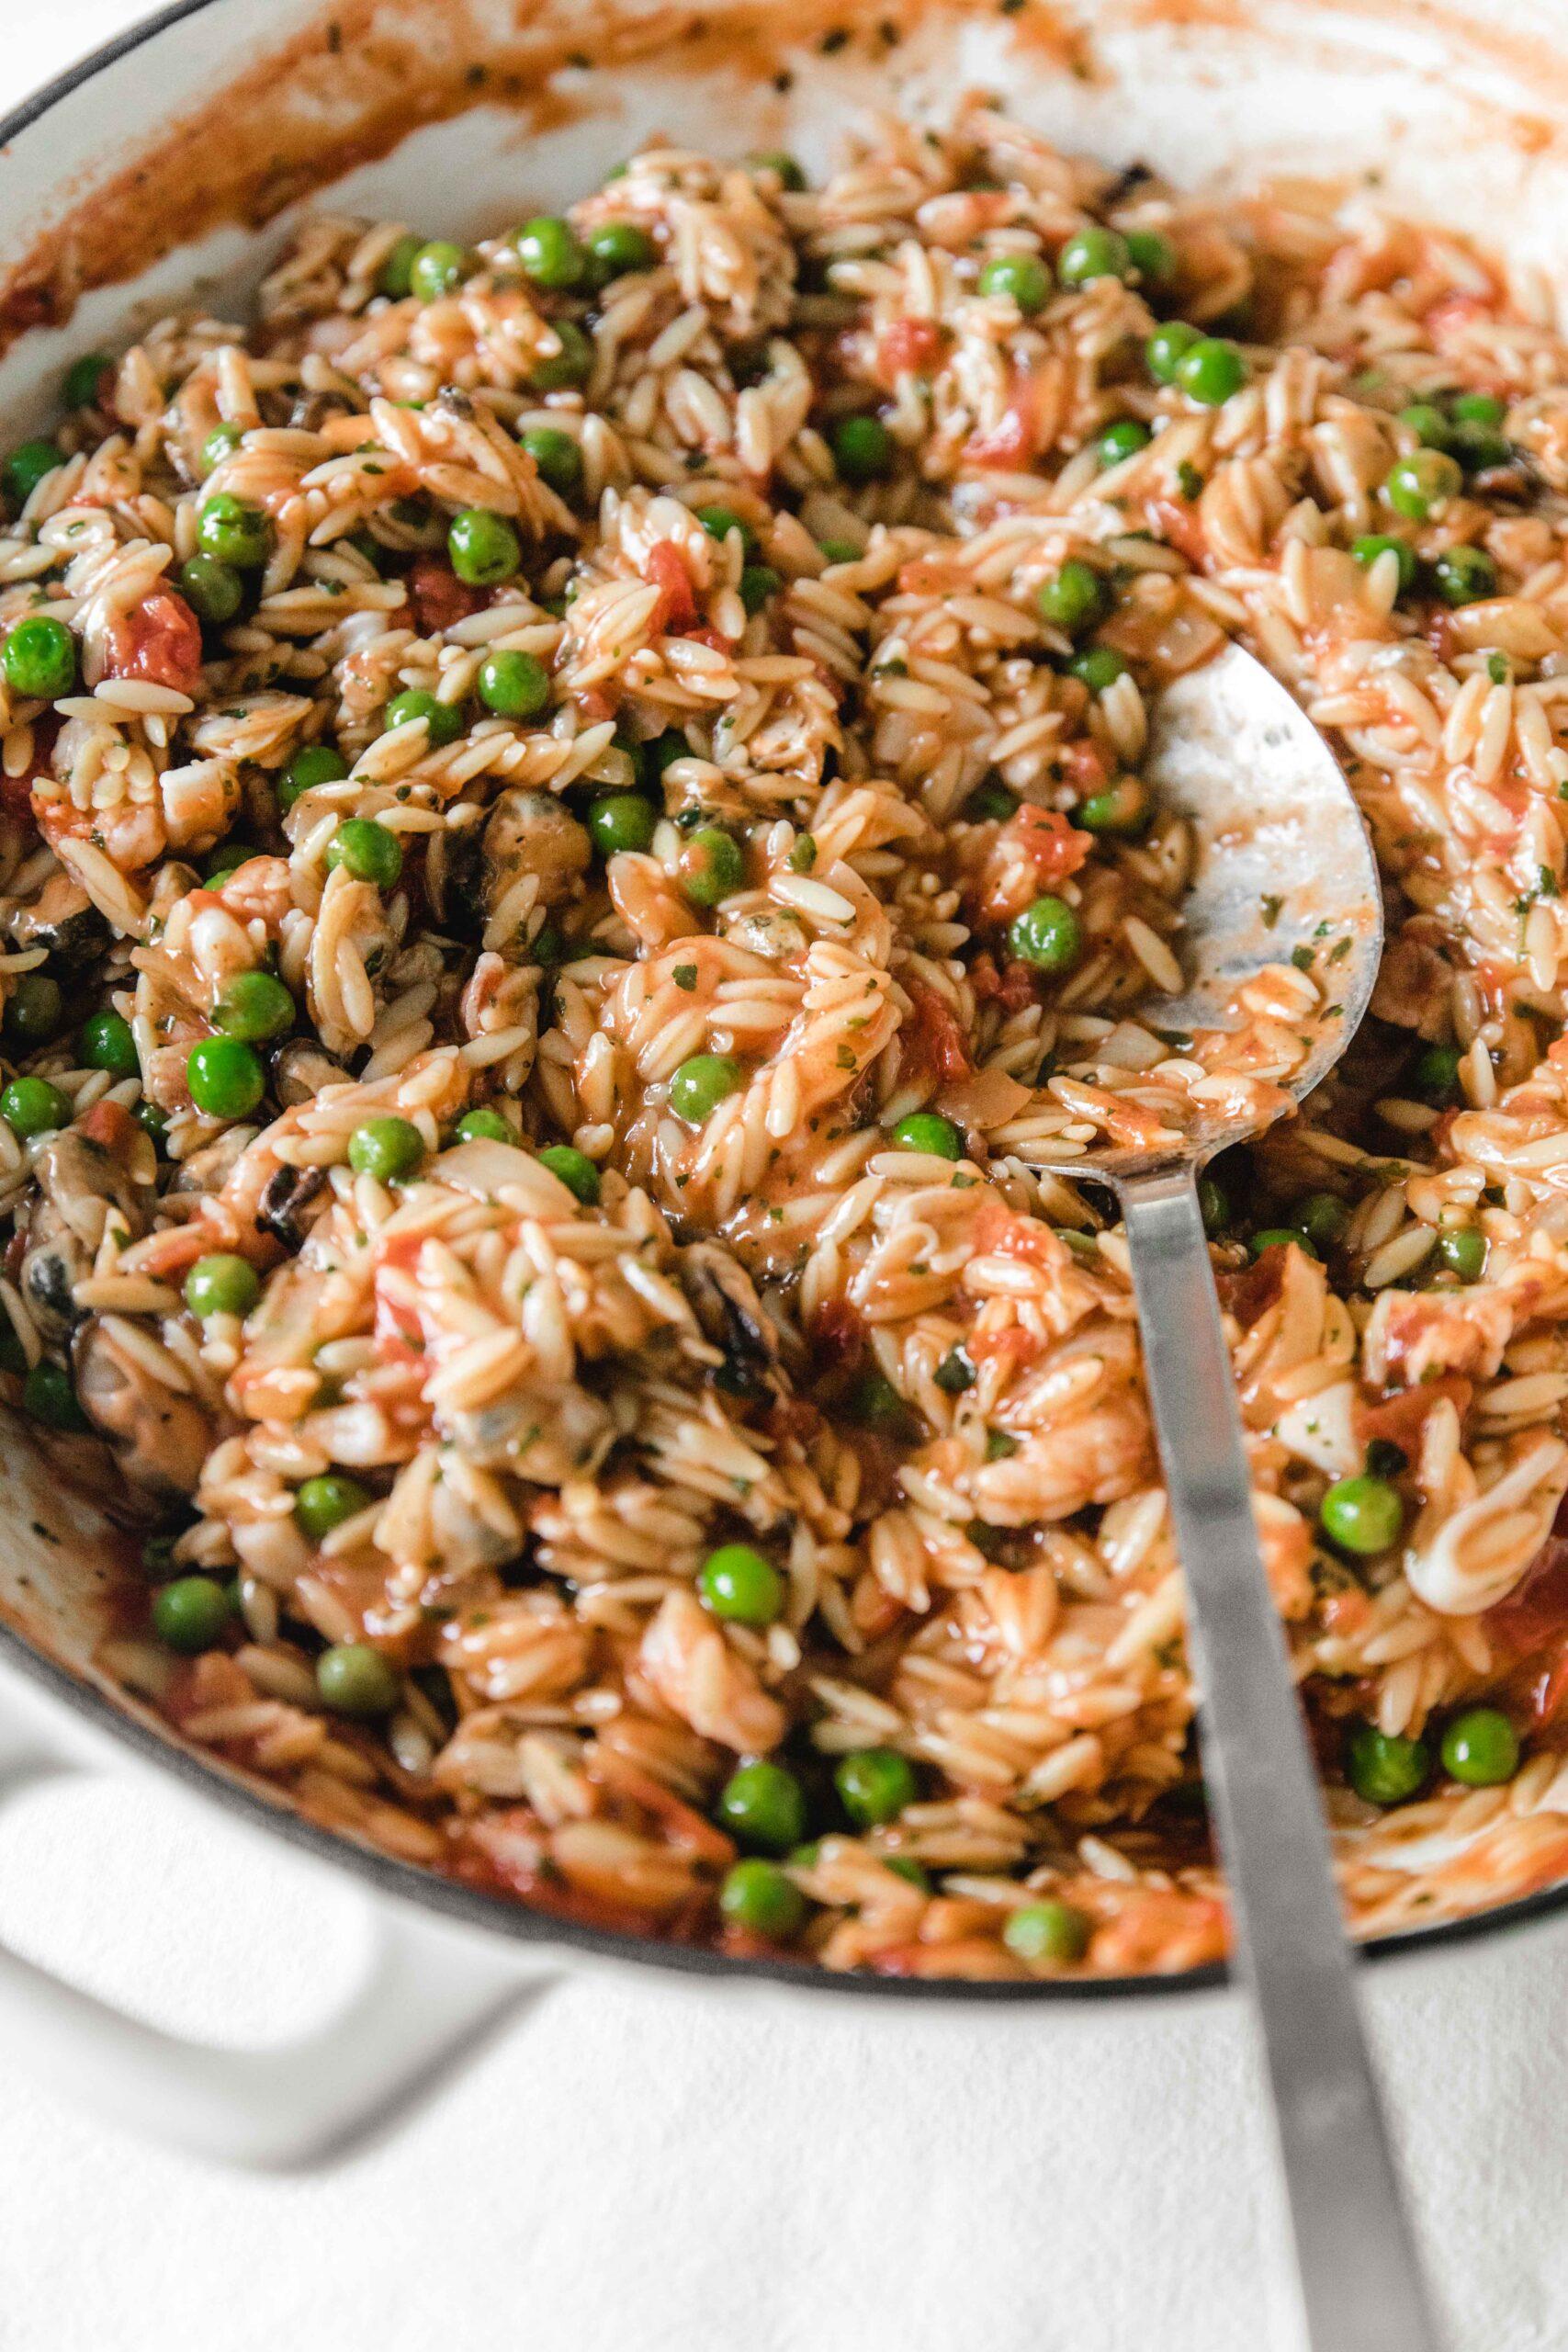 Orzo pasta recipe with shrimp